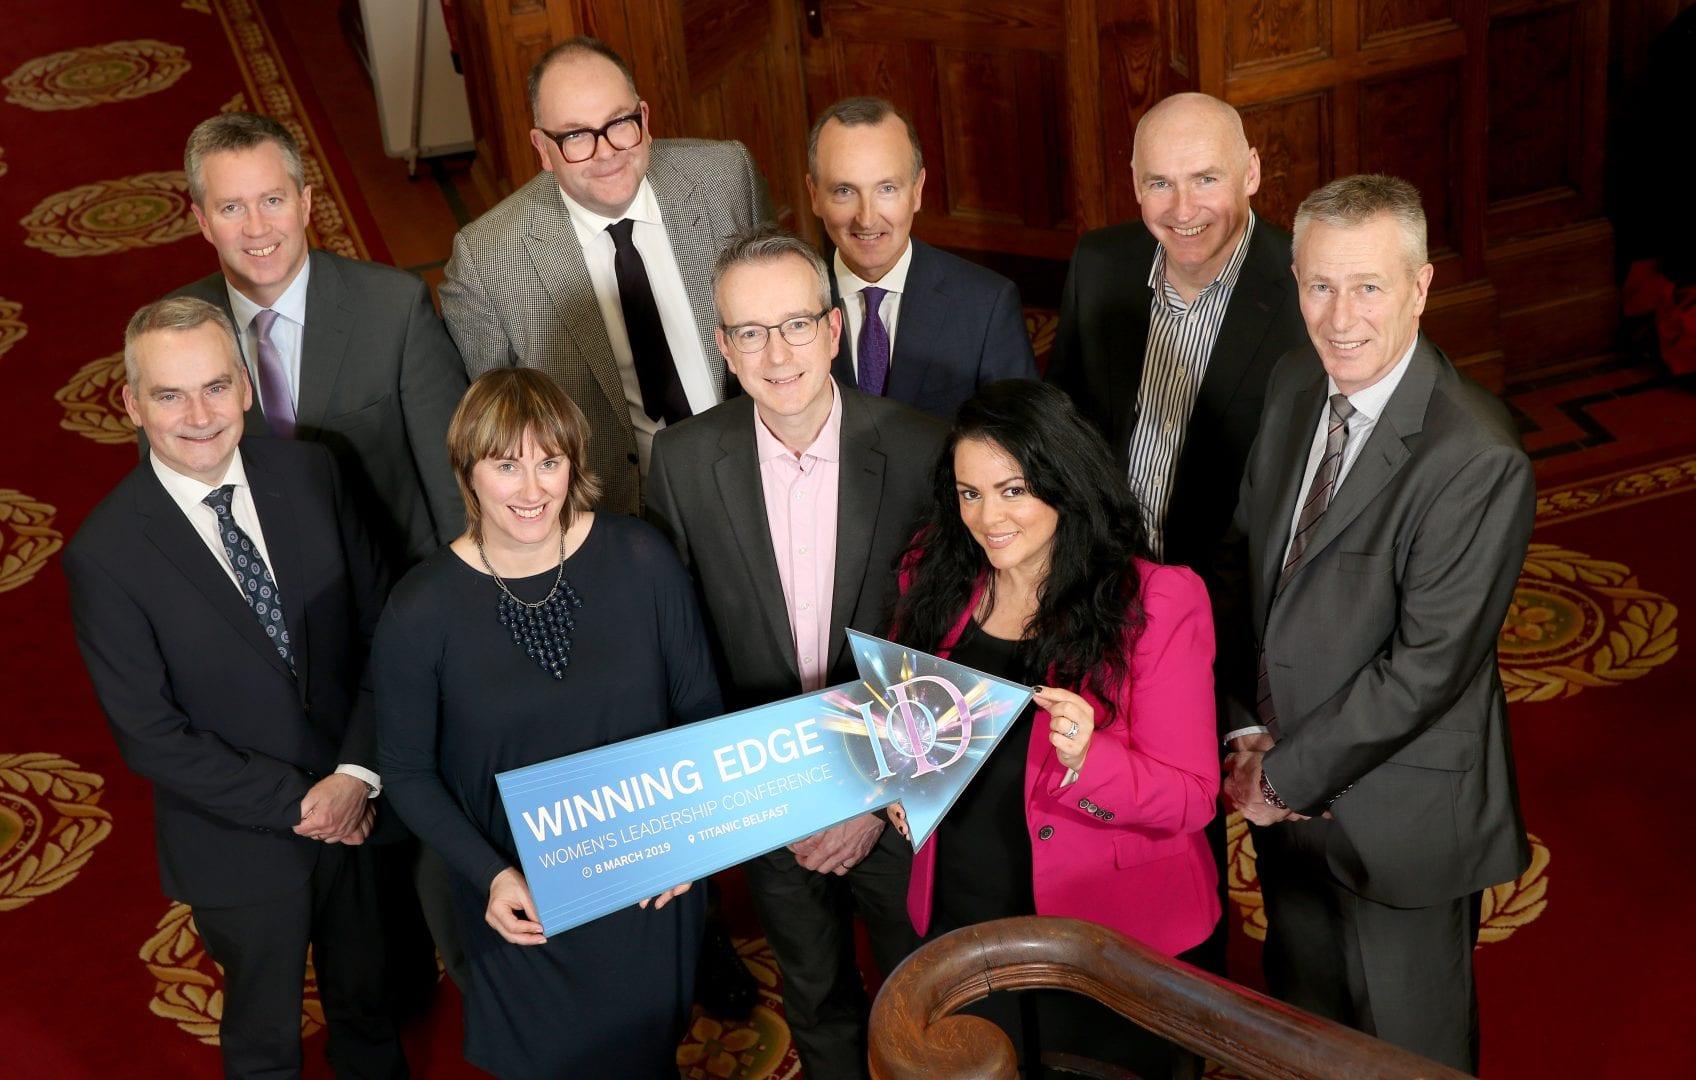 Institute of Directors Northern Ireland Women's Leadership Conference